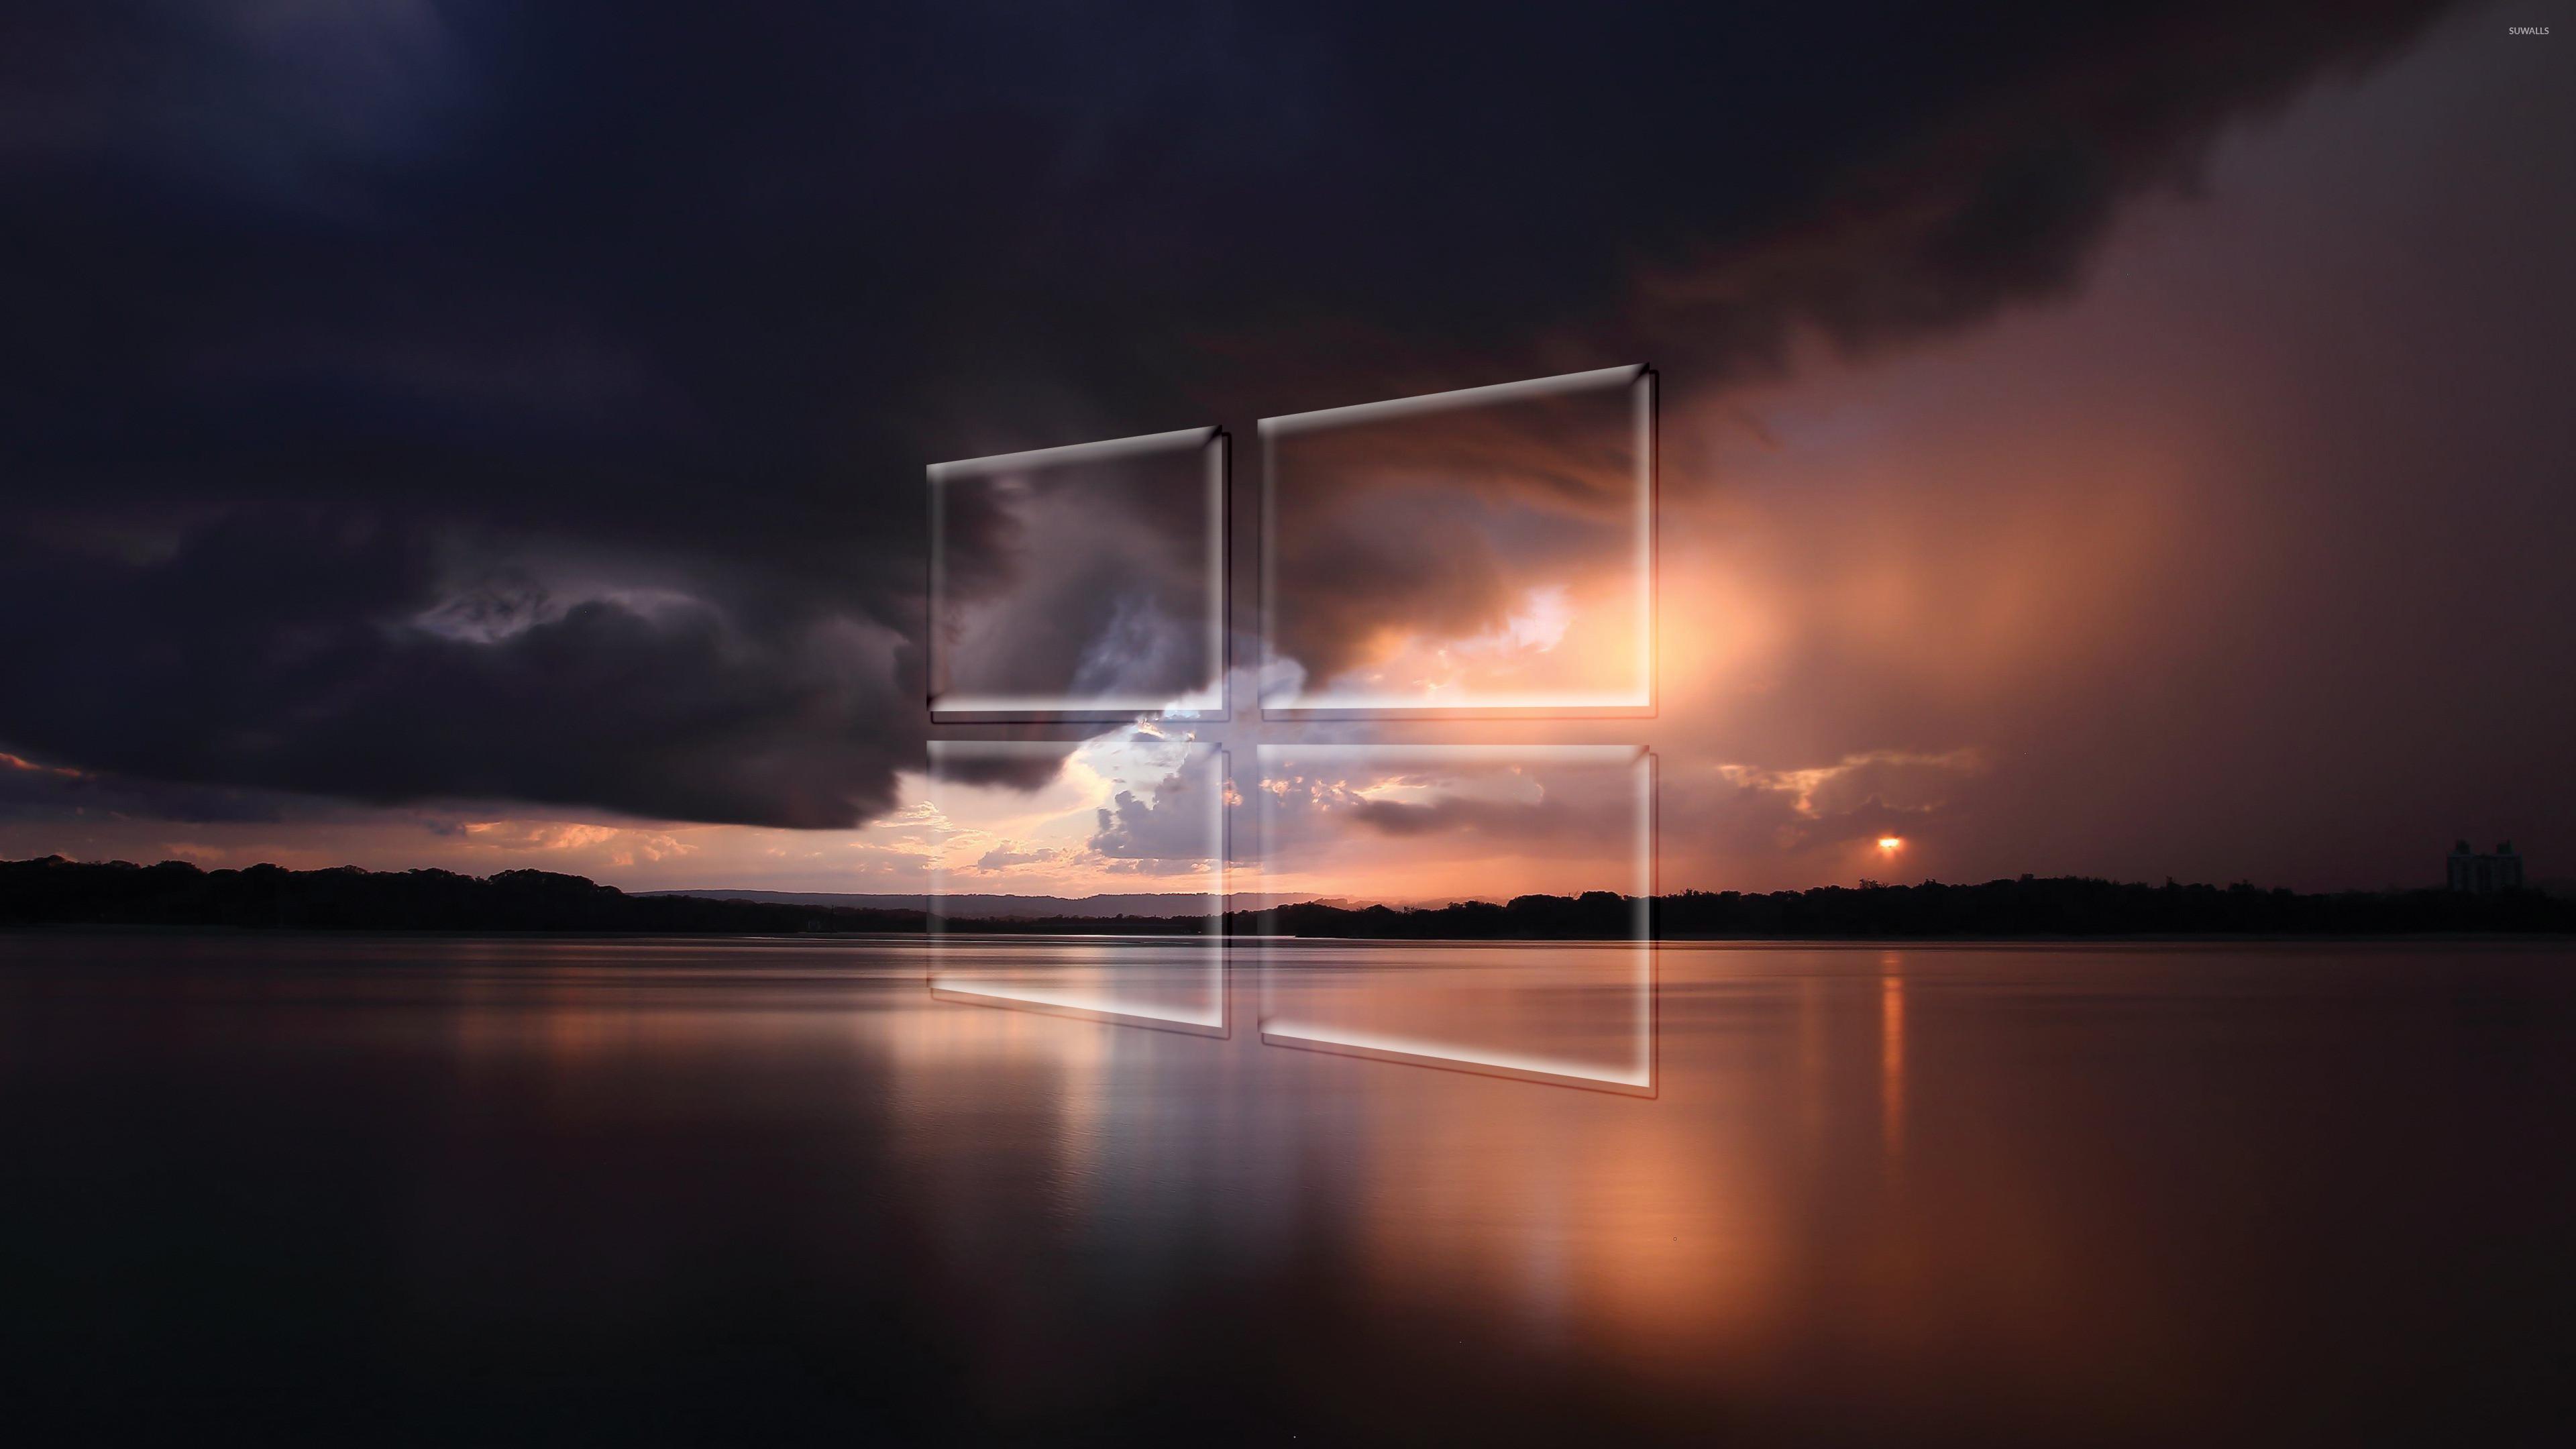 1920x1200 Hd Download High Definiton Wallpapers Desktop Images Windows 10 Backgrounds Wallpaper Select Resolution A Original